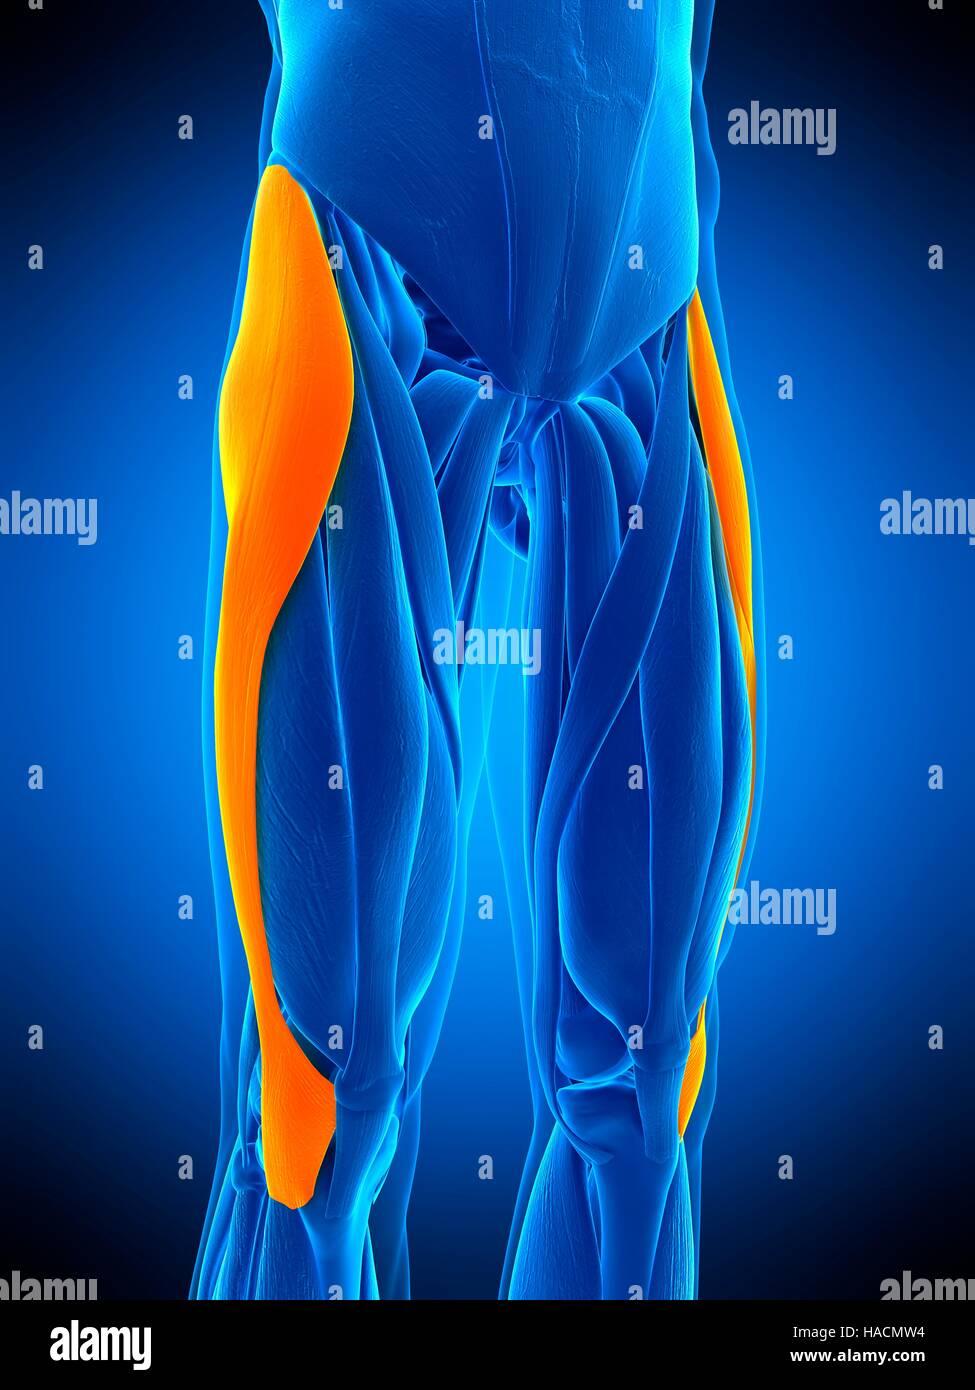 Illustration der Tensor Fascia Lata Muskel Stockfoto, Bild ...